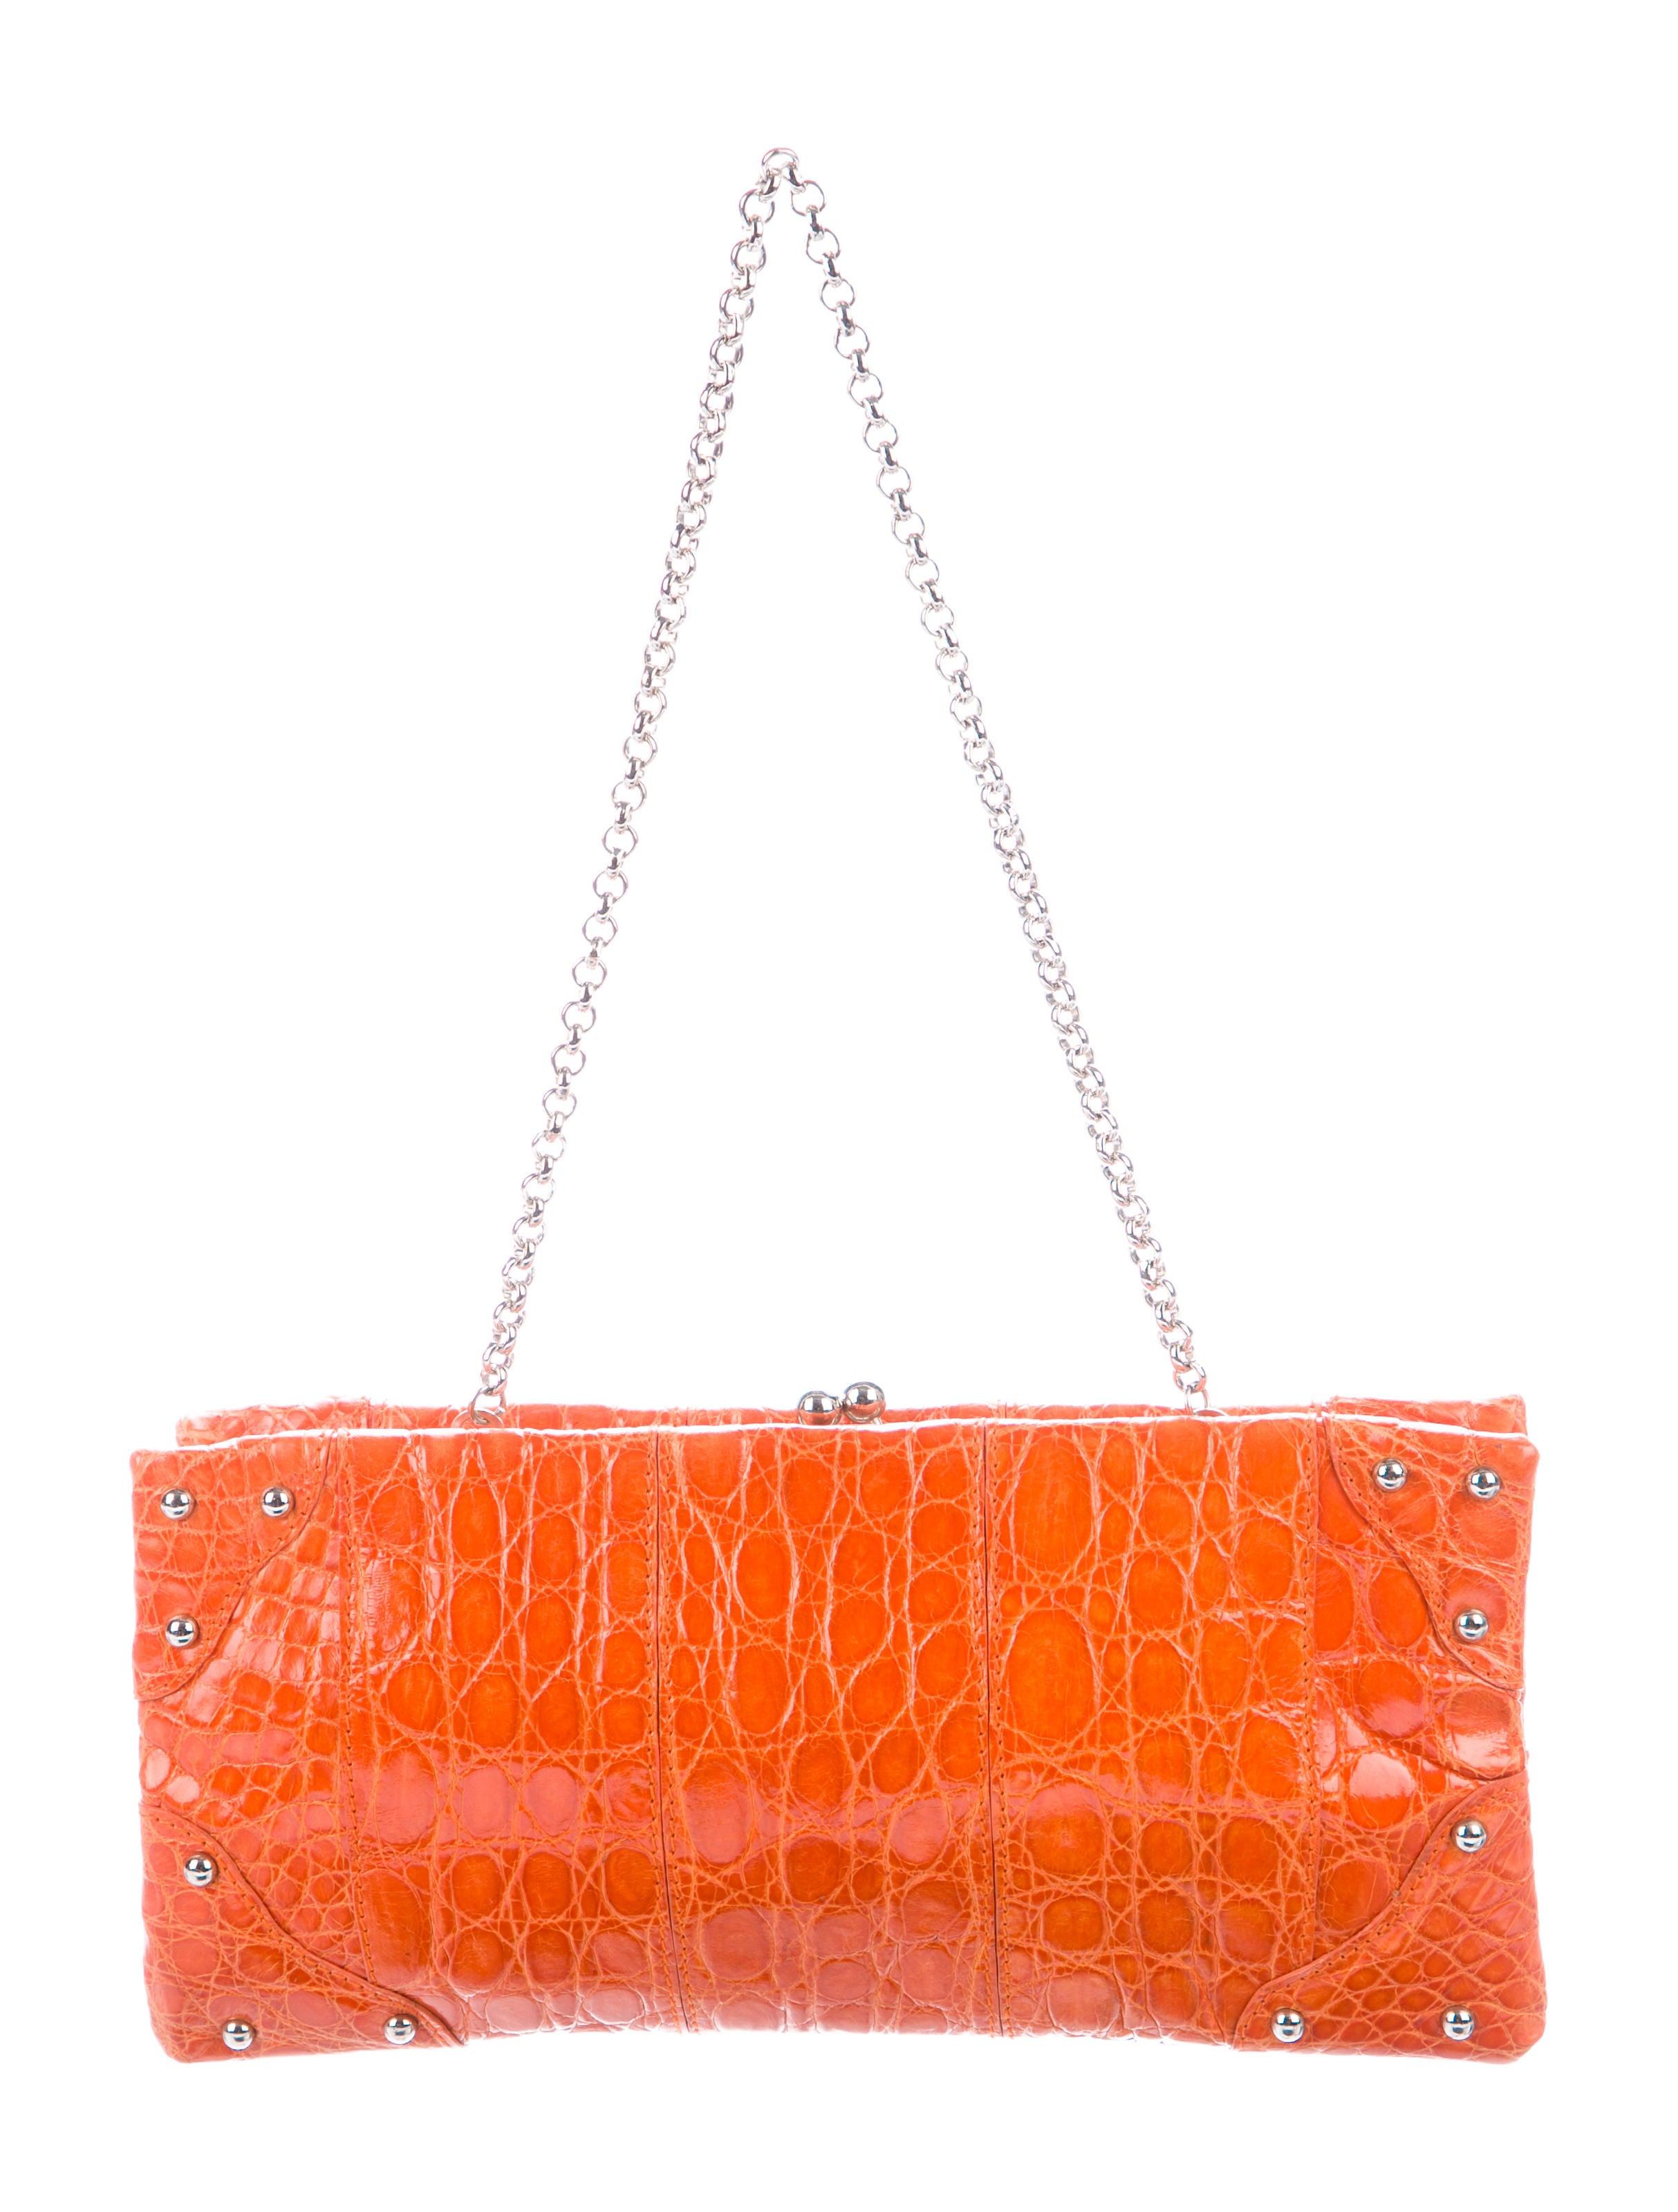 c4a0d31fe2 Dolce   Gabbana Crocodile Frame Clutch - Handbags - DAG111236